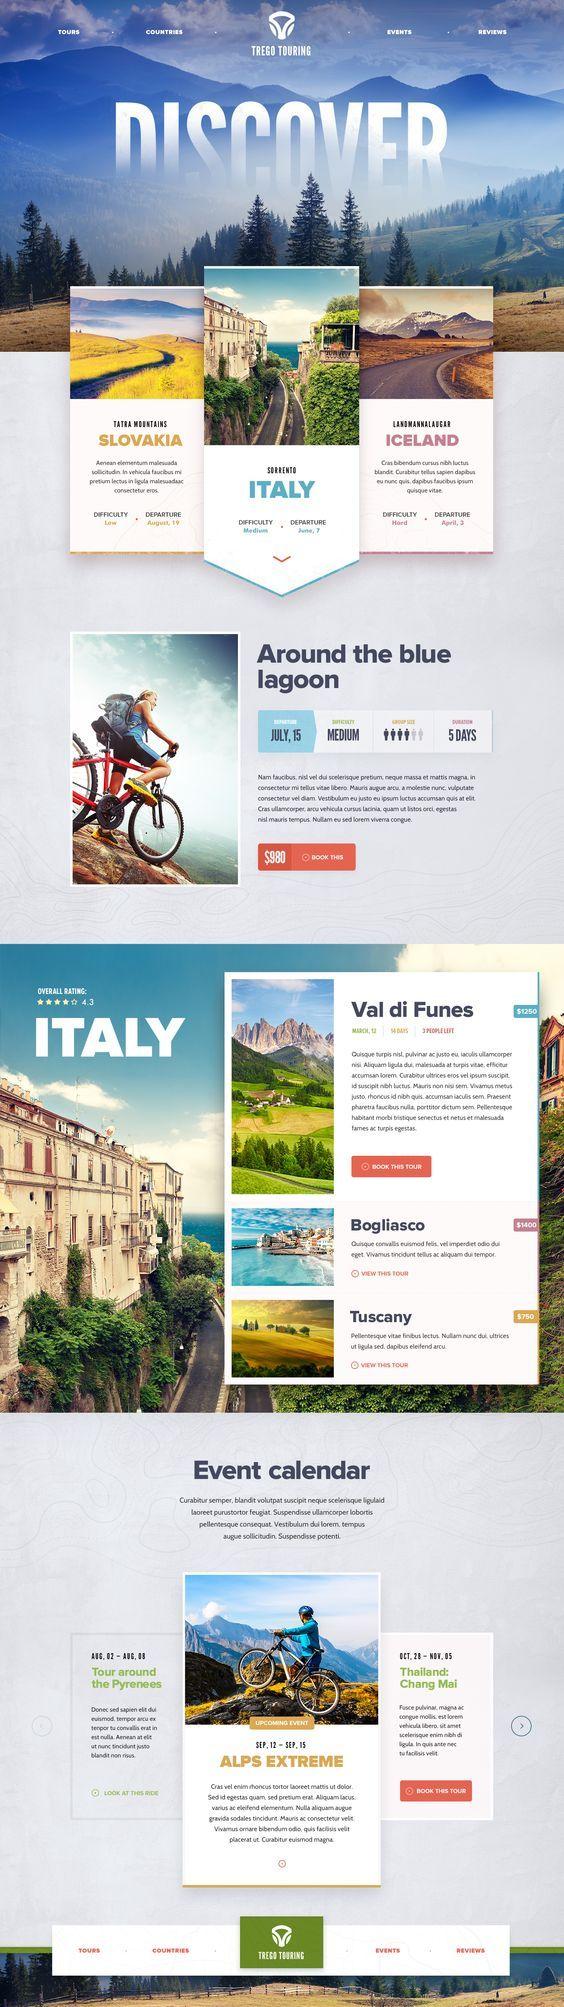 Travel website design #webdesign #inspiration #layout #travel